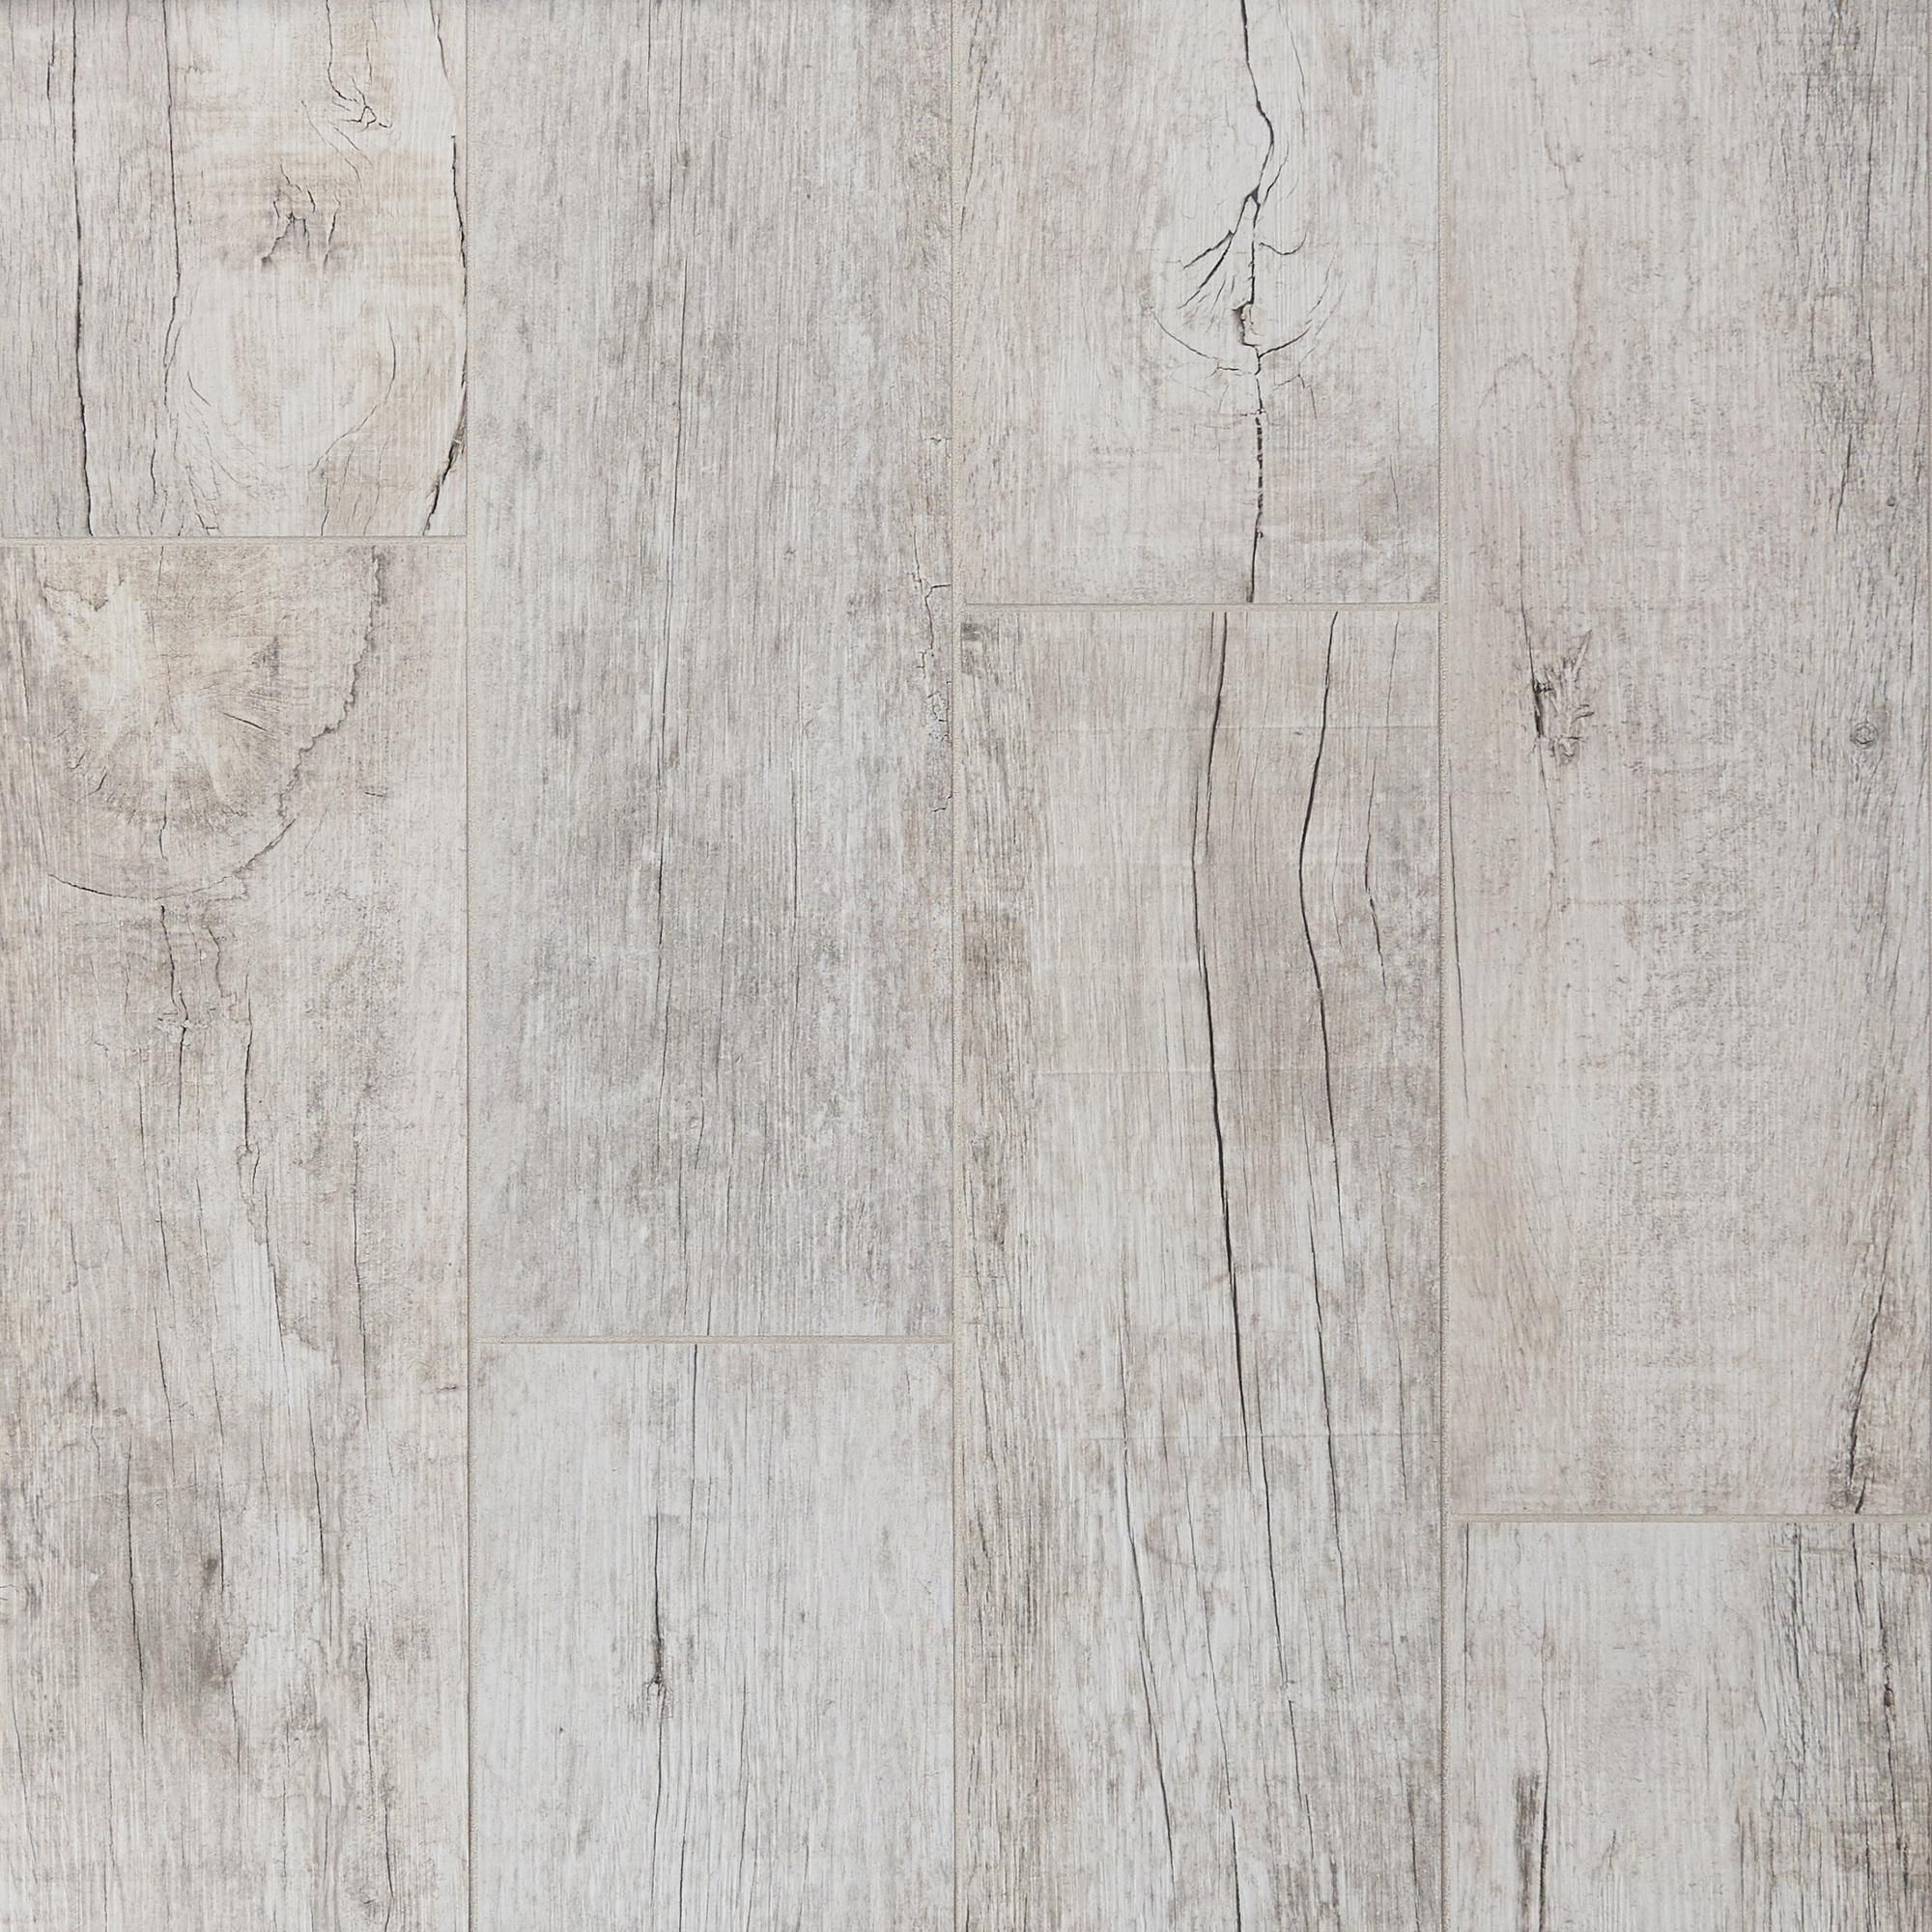 Frontier Light Wood Plank Porcelain Tile Wood Look Tile